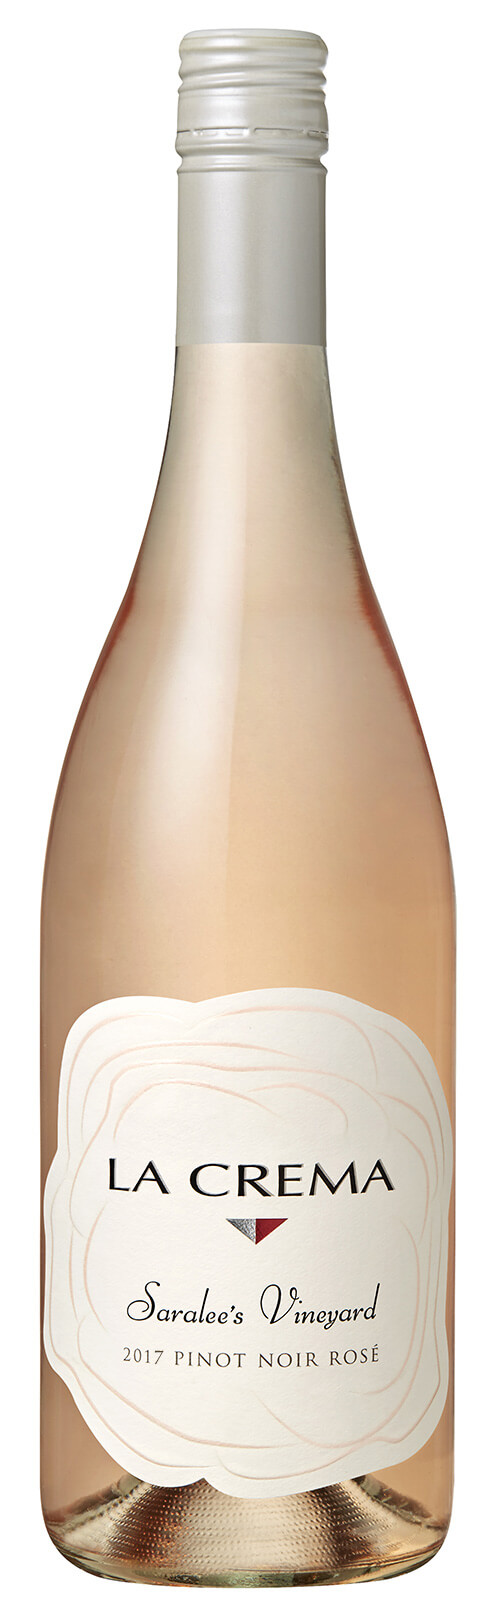 2017 Saralee's Vineyard Pinot Noir Rosé